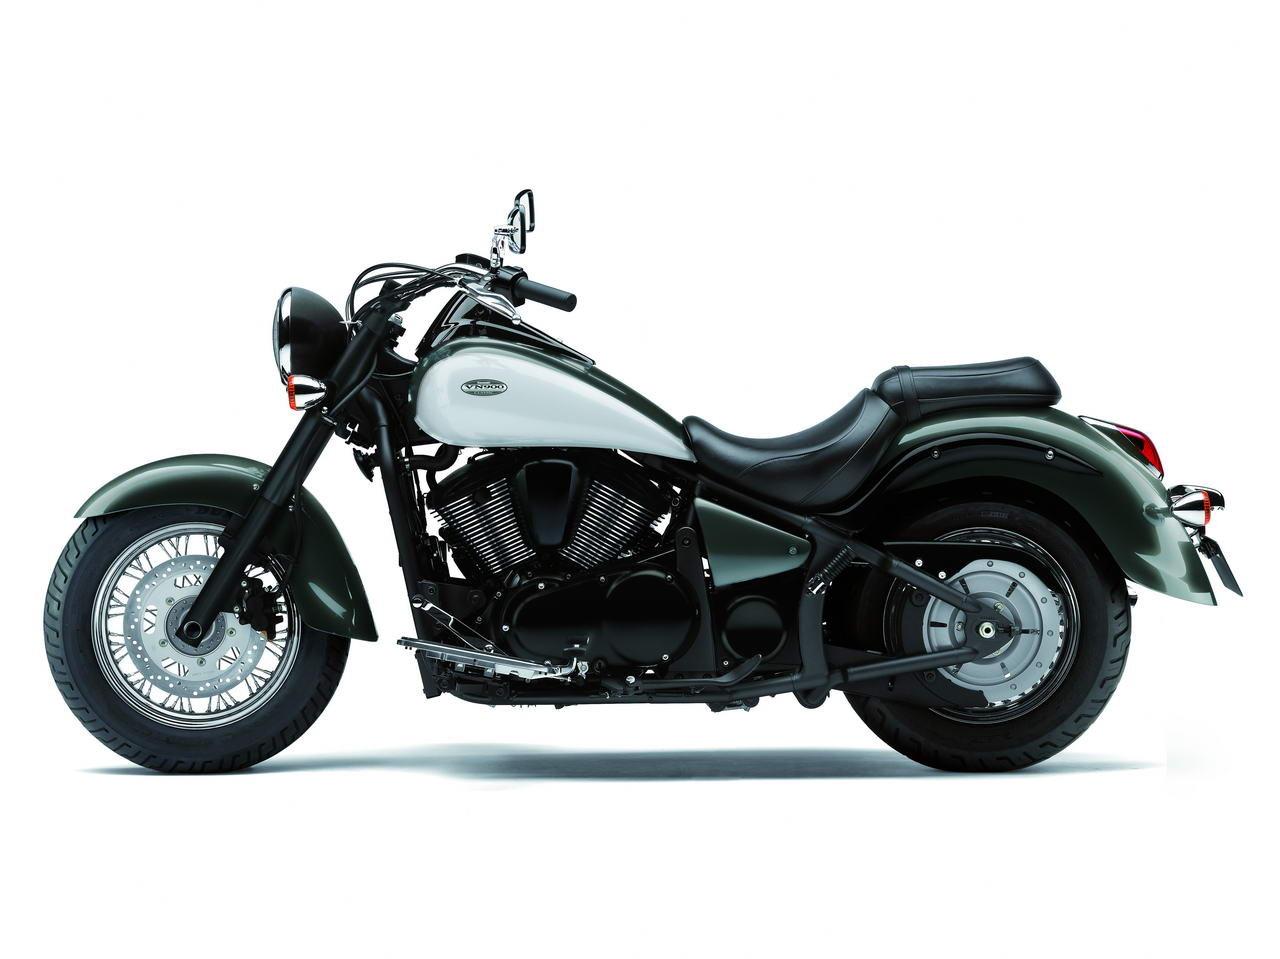 Listino Kawasaki Versys Base Granturismo on-off - image 15529_kawasaki-vn1700-classic on http://moto.motori.net